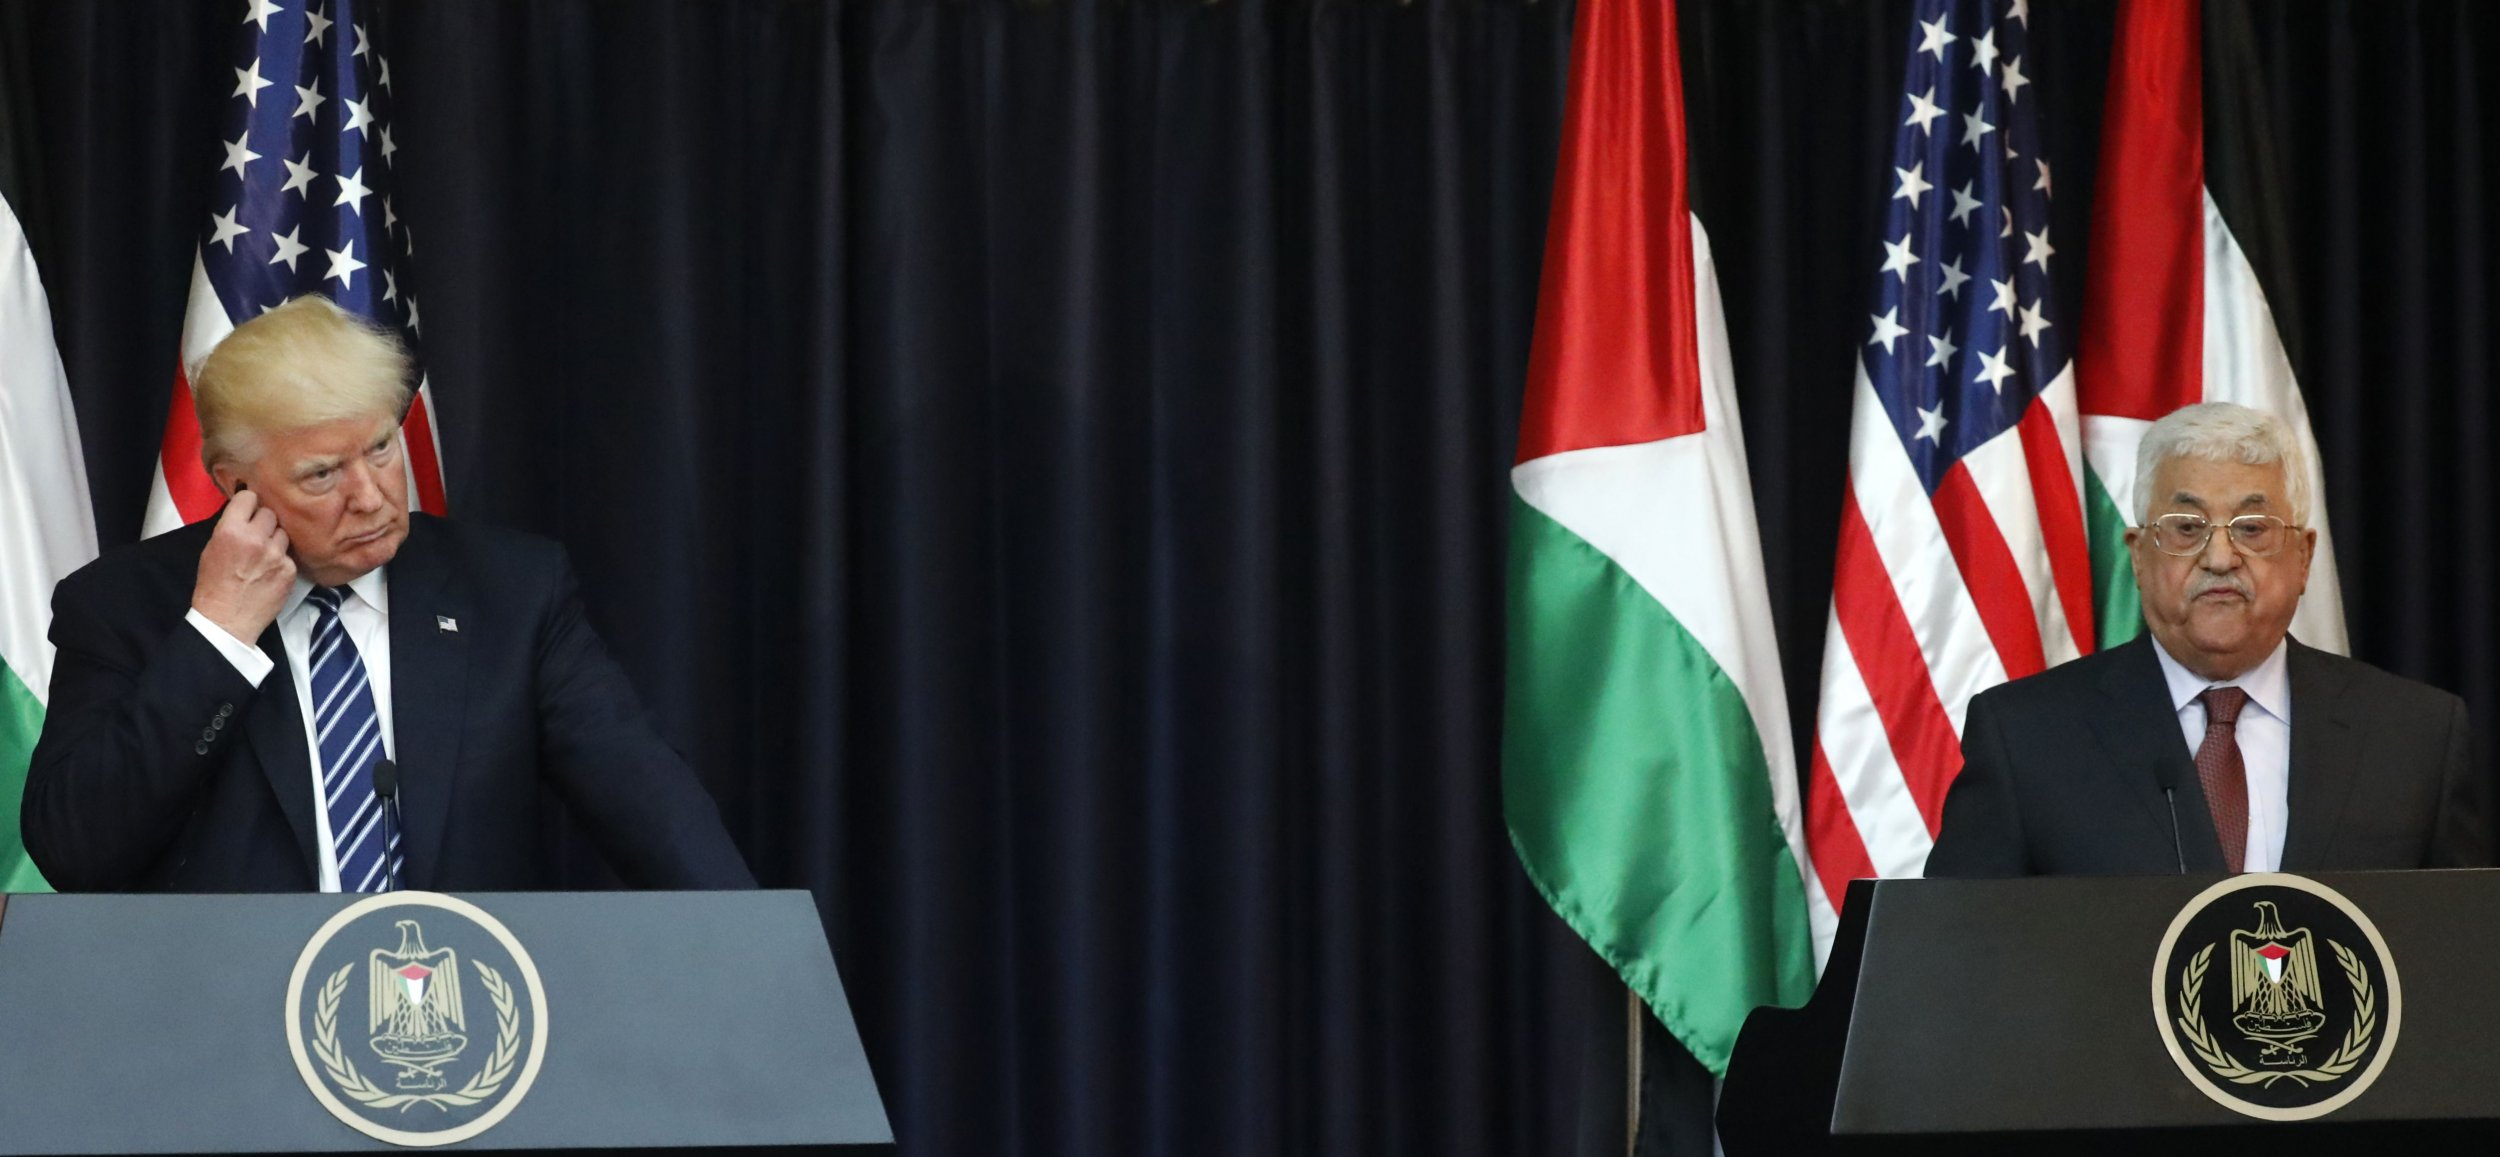 President Trump and President Abbas